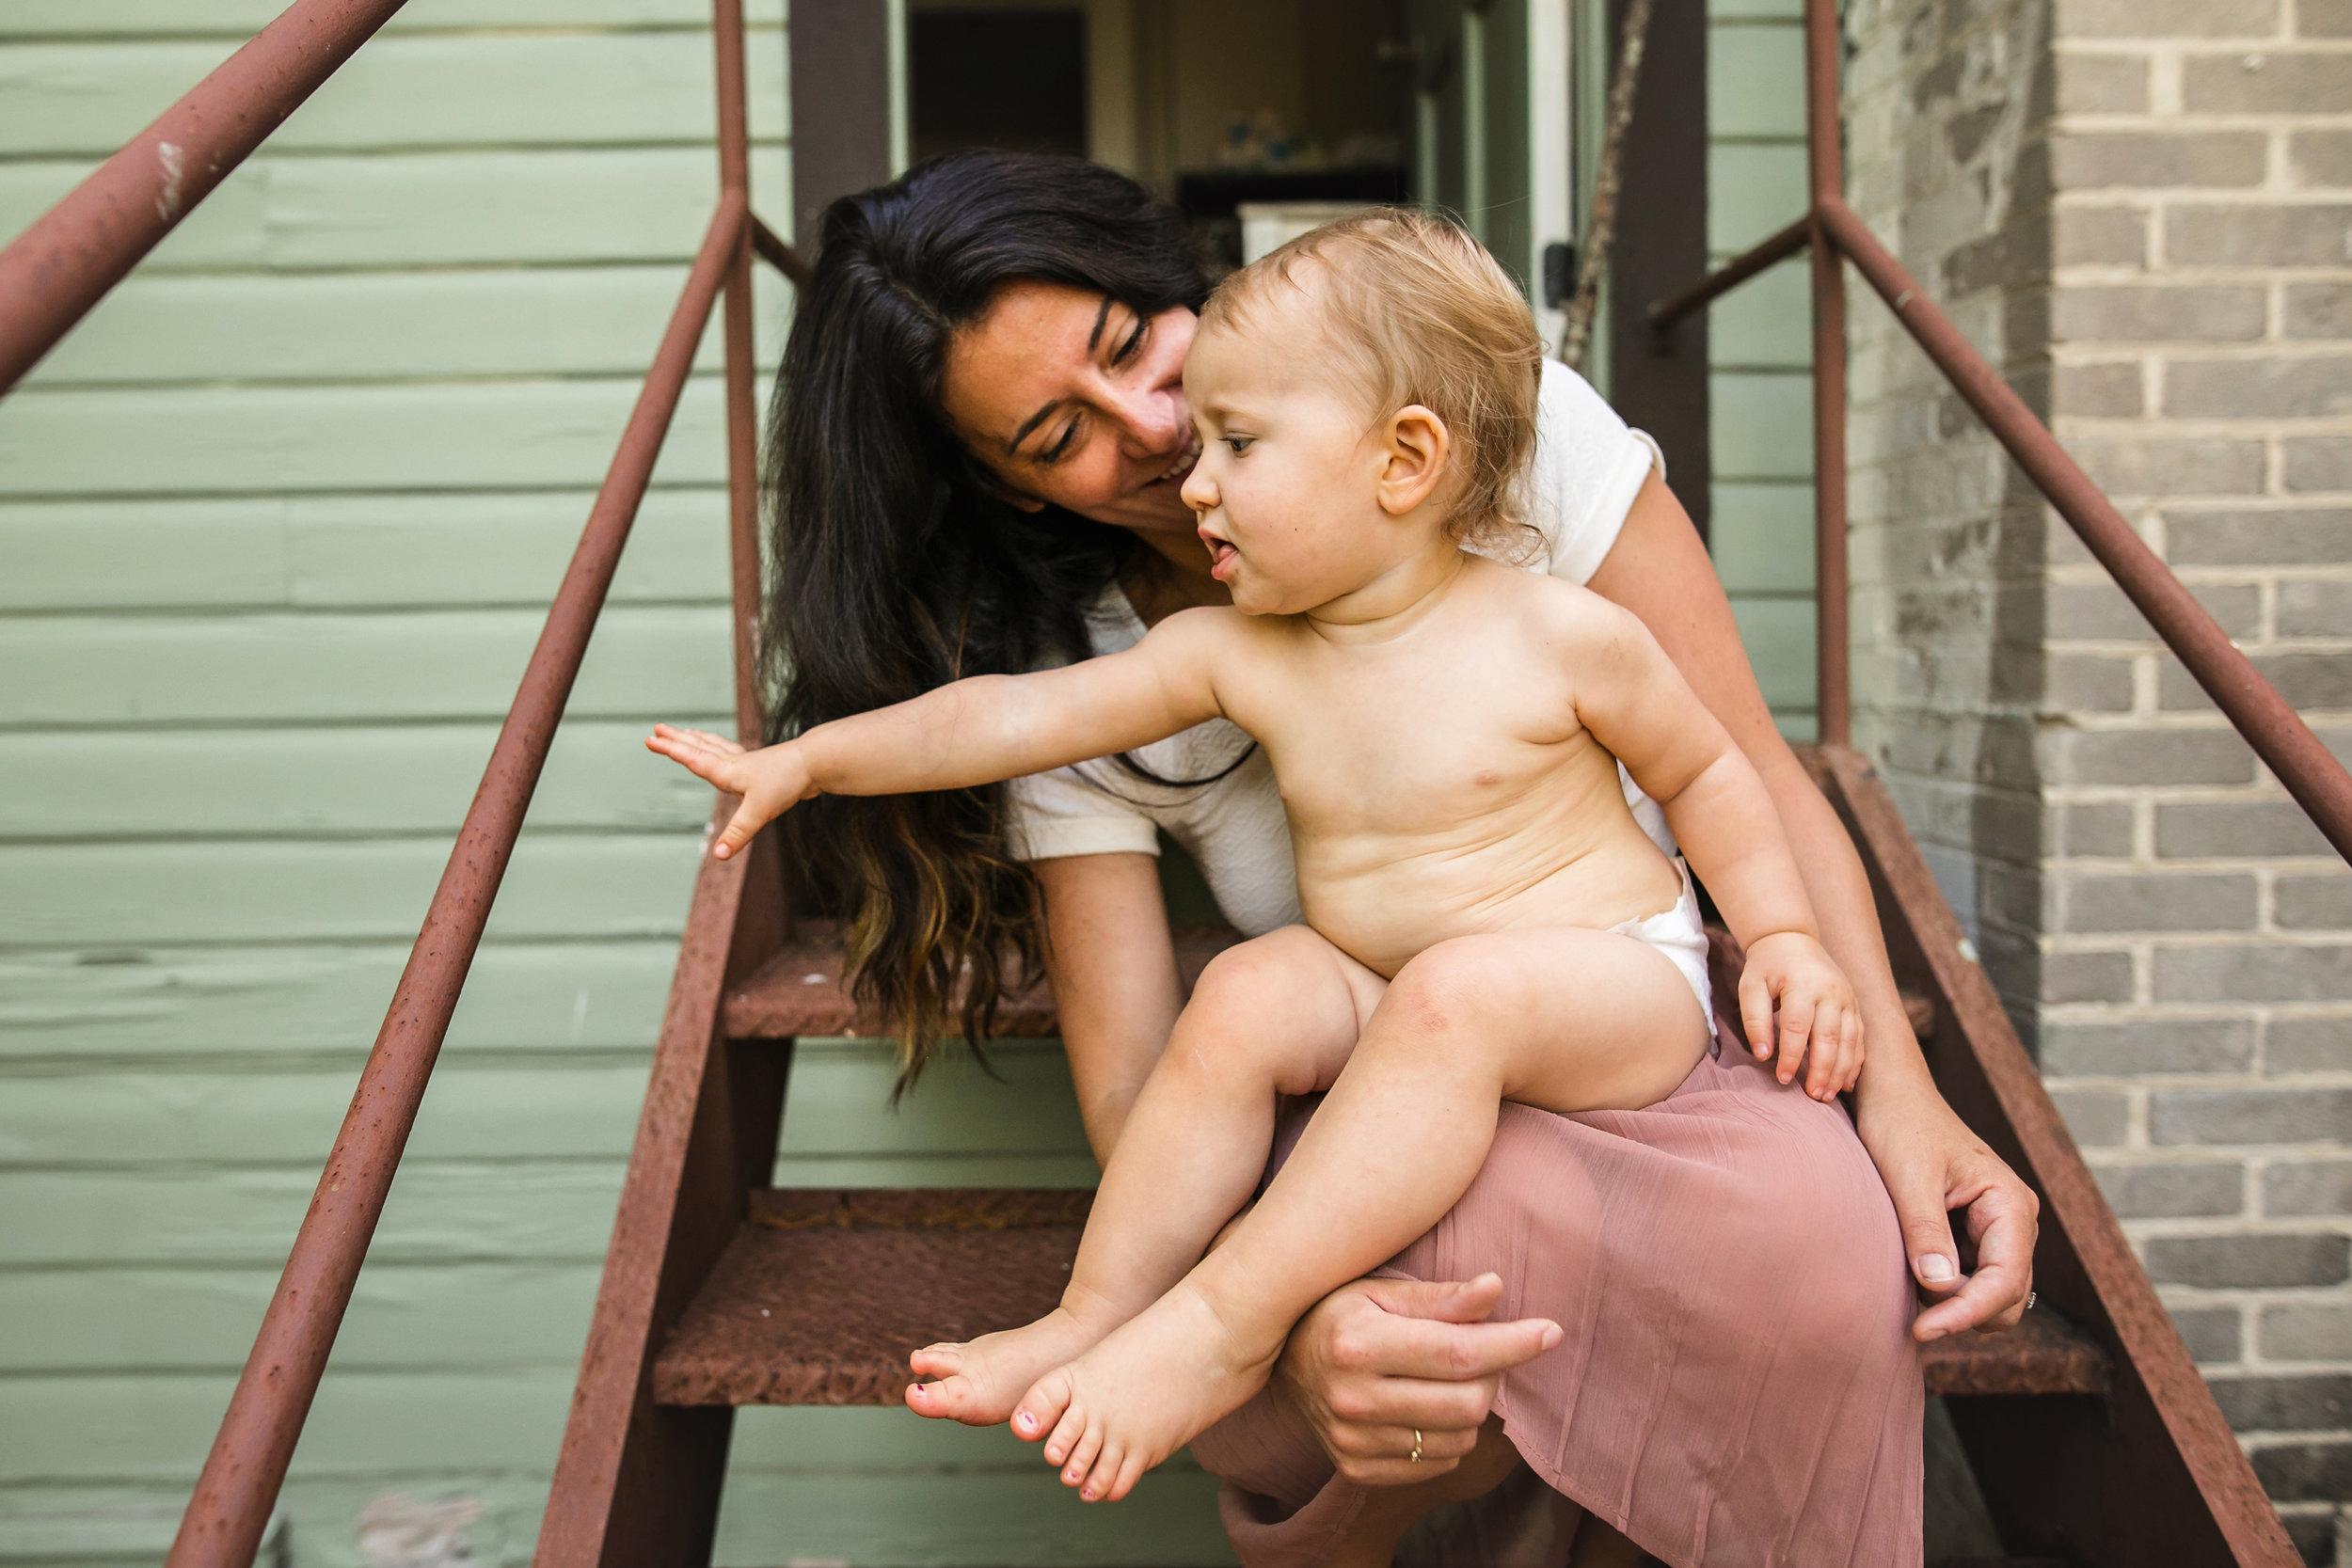 baby sits on moms lap wearing diaper 2-(ZF-0126-04493-1-019).jpg